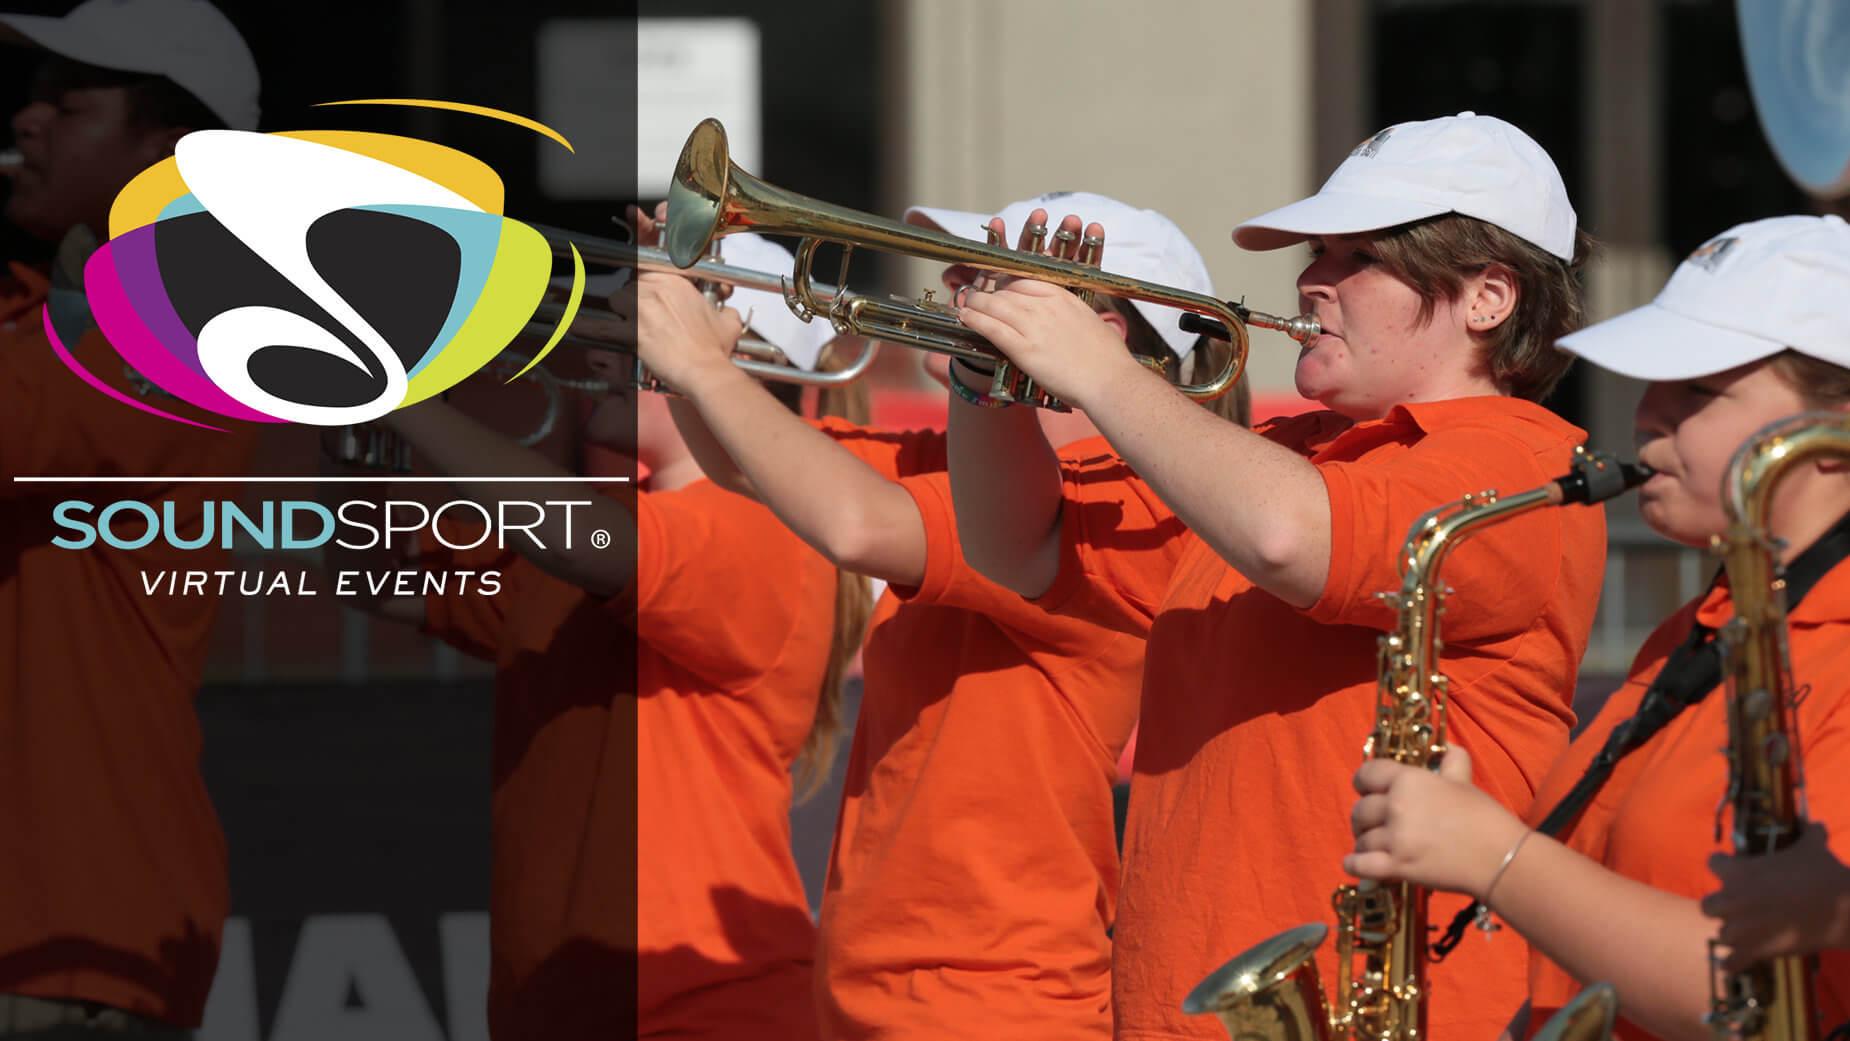 SoundSport Virtual Events